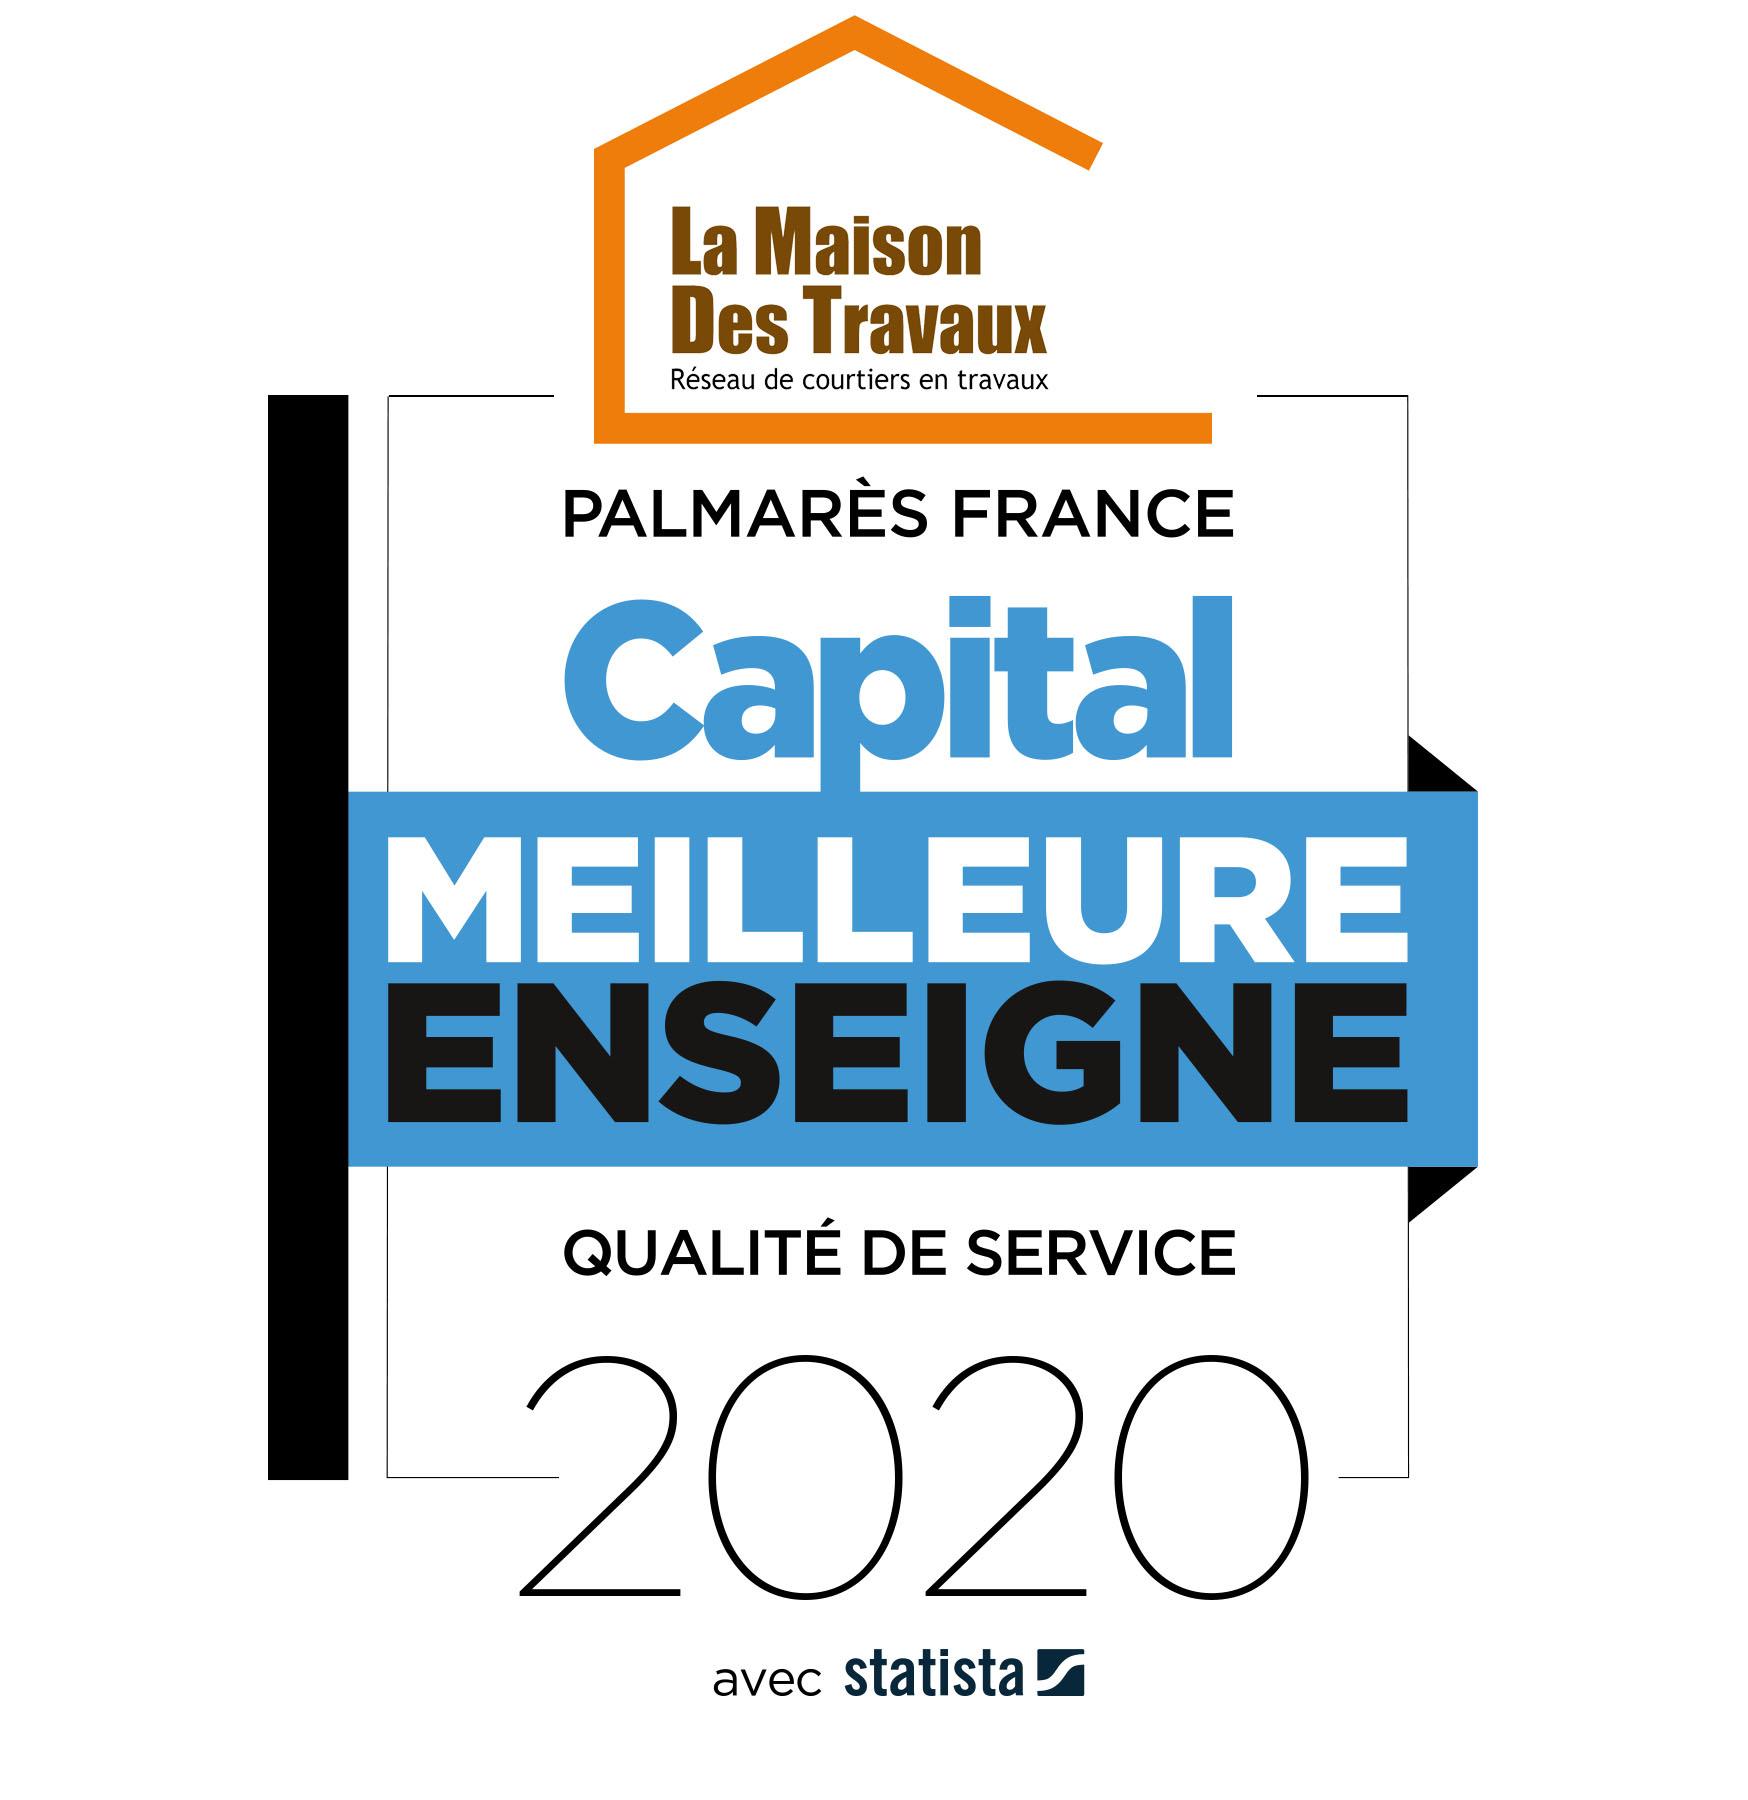 LOGO-2020-LA_MAISON_DES_TRAVAUX.jpg